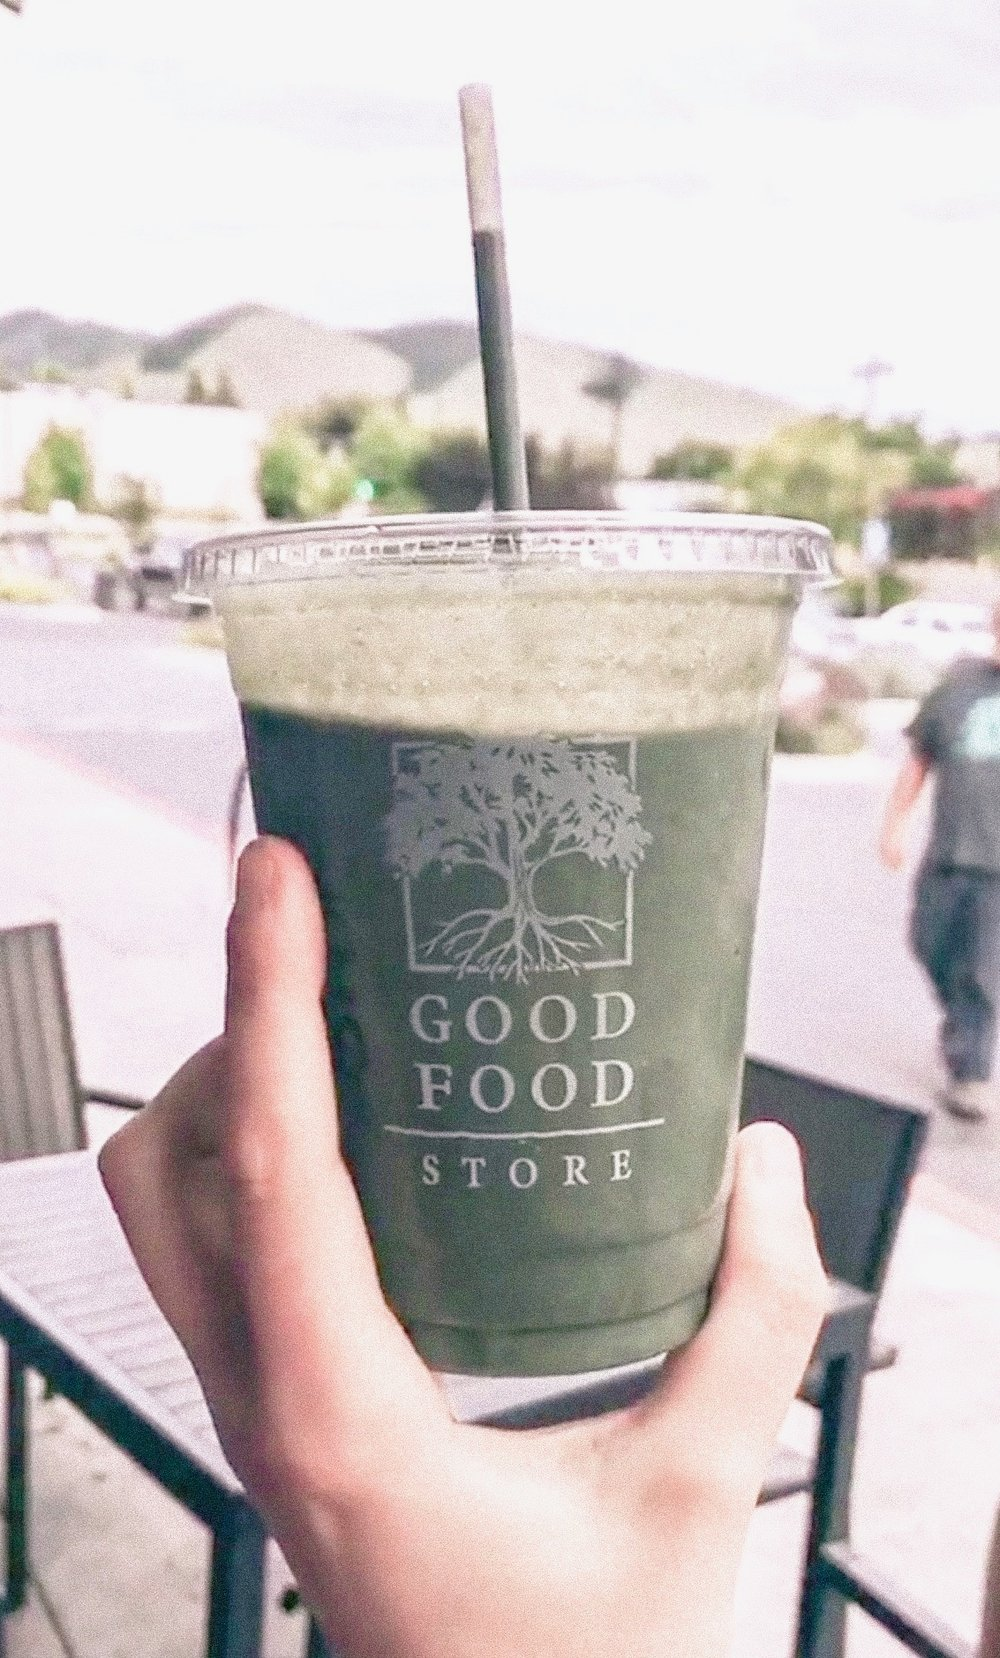 Custom Smoothie, Good Food Store - Image via Amanda Kaplan